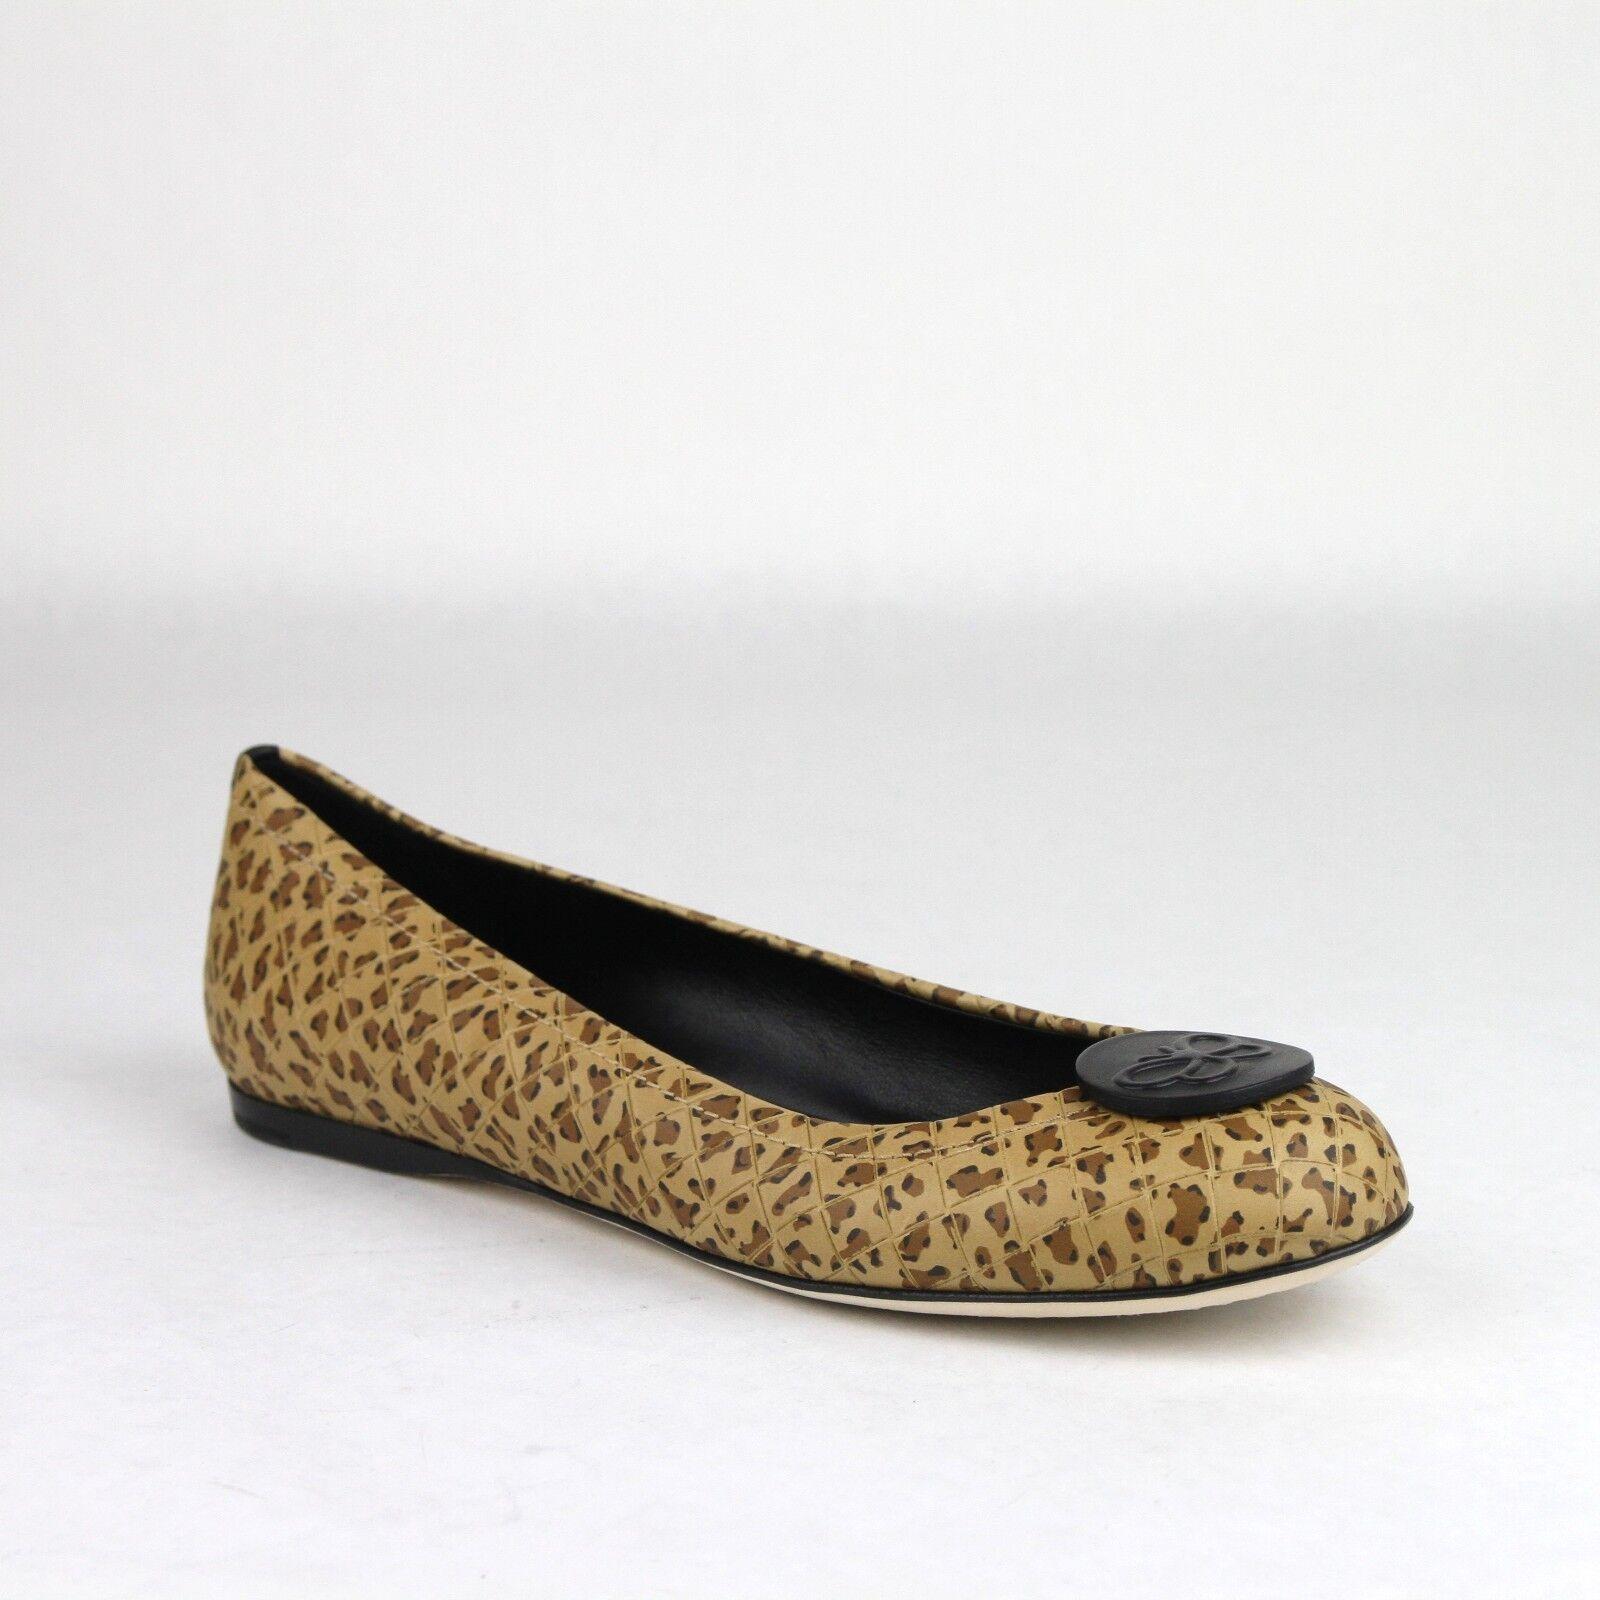 $610 Bottega Veneta Women's Cheetah Print Print Cheetah Leather Ballerina Flats 38 338265 8465 5ac1e9